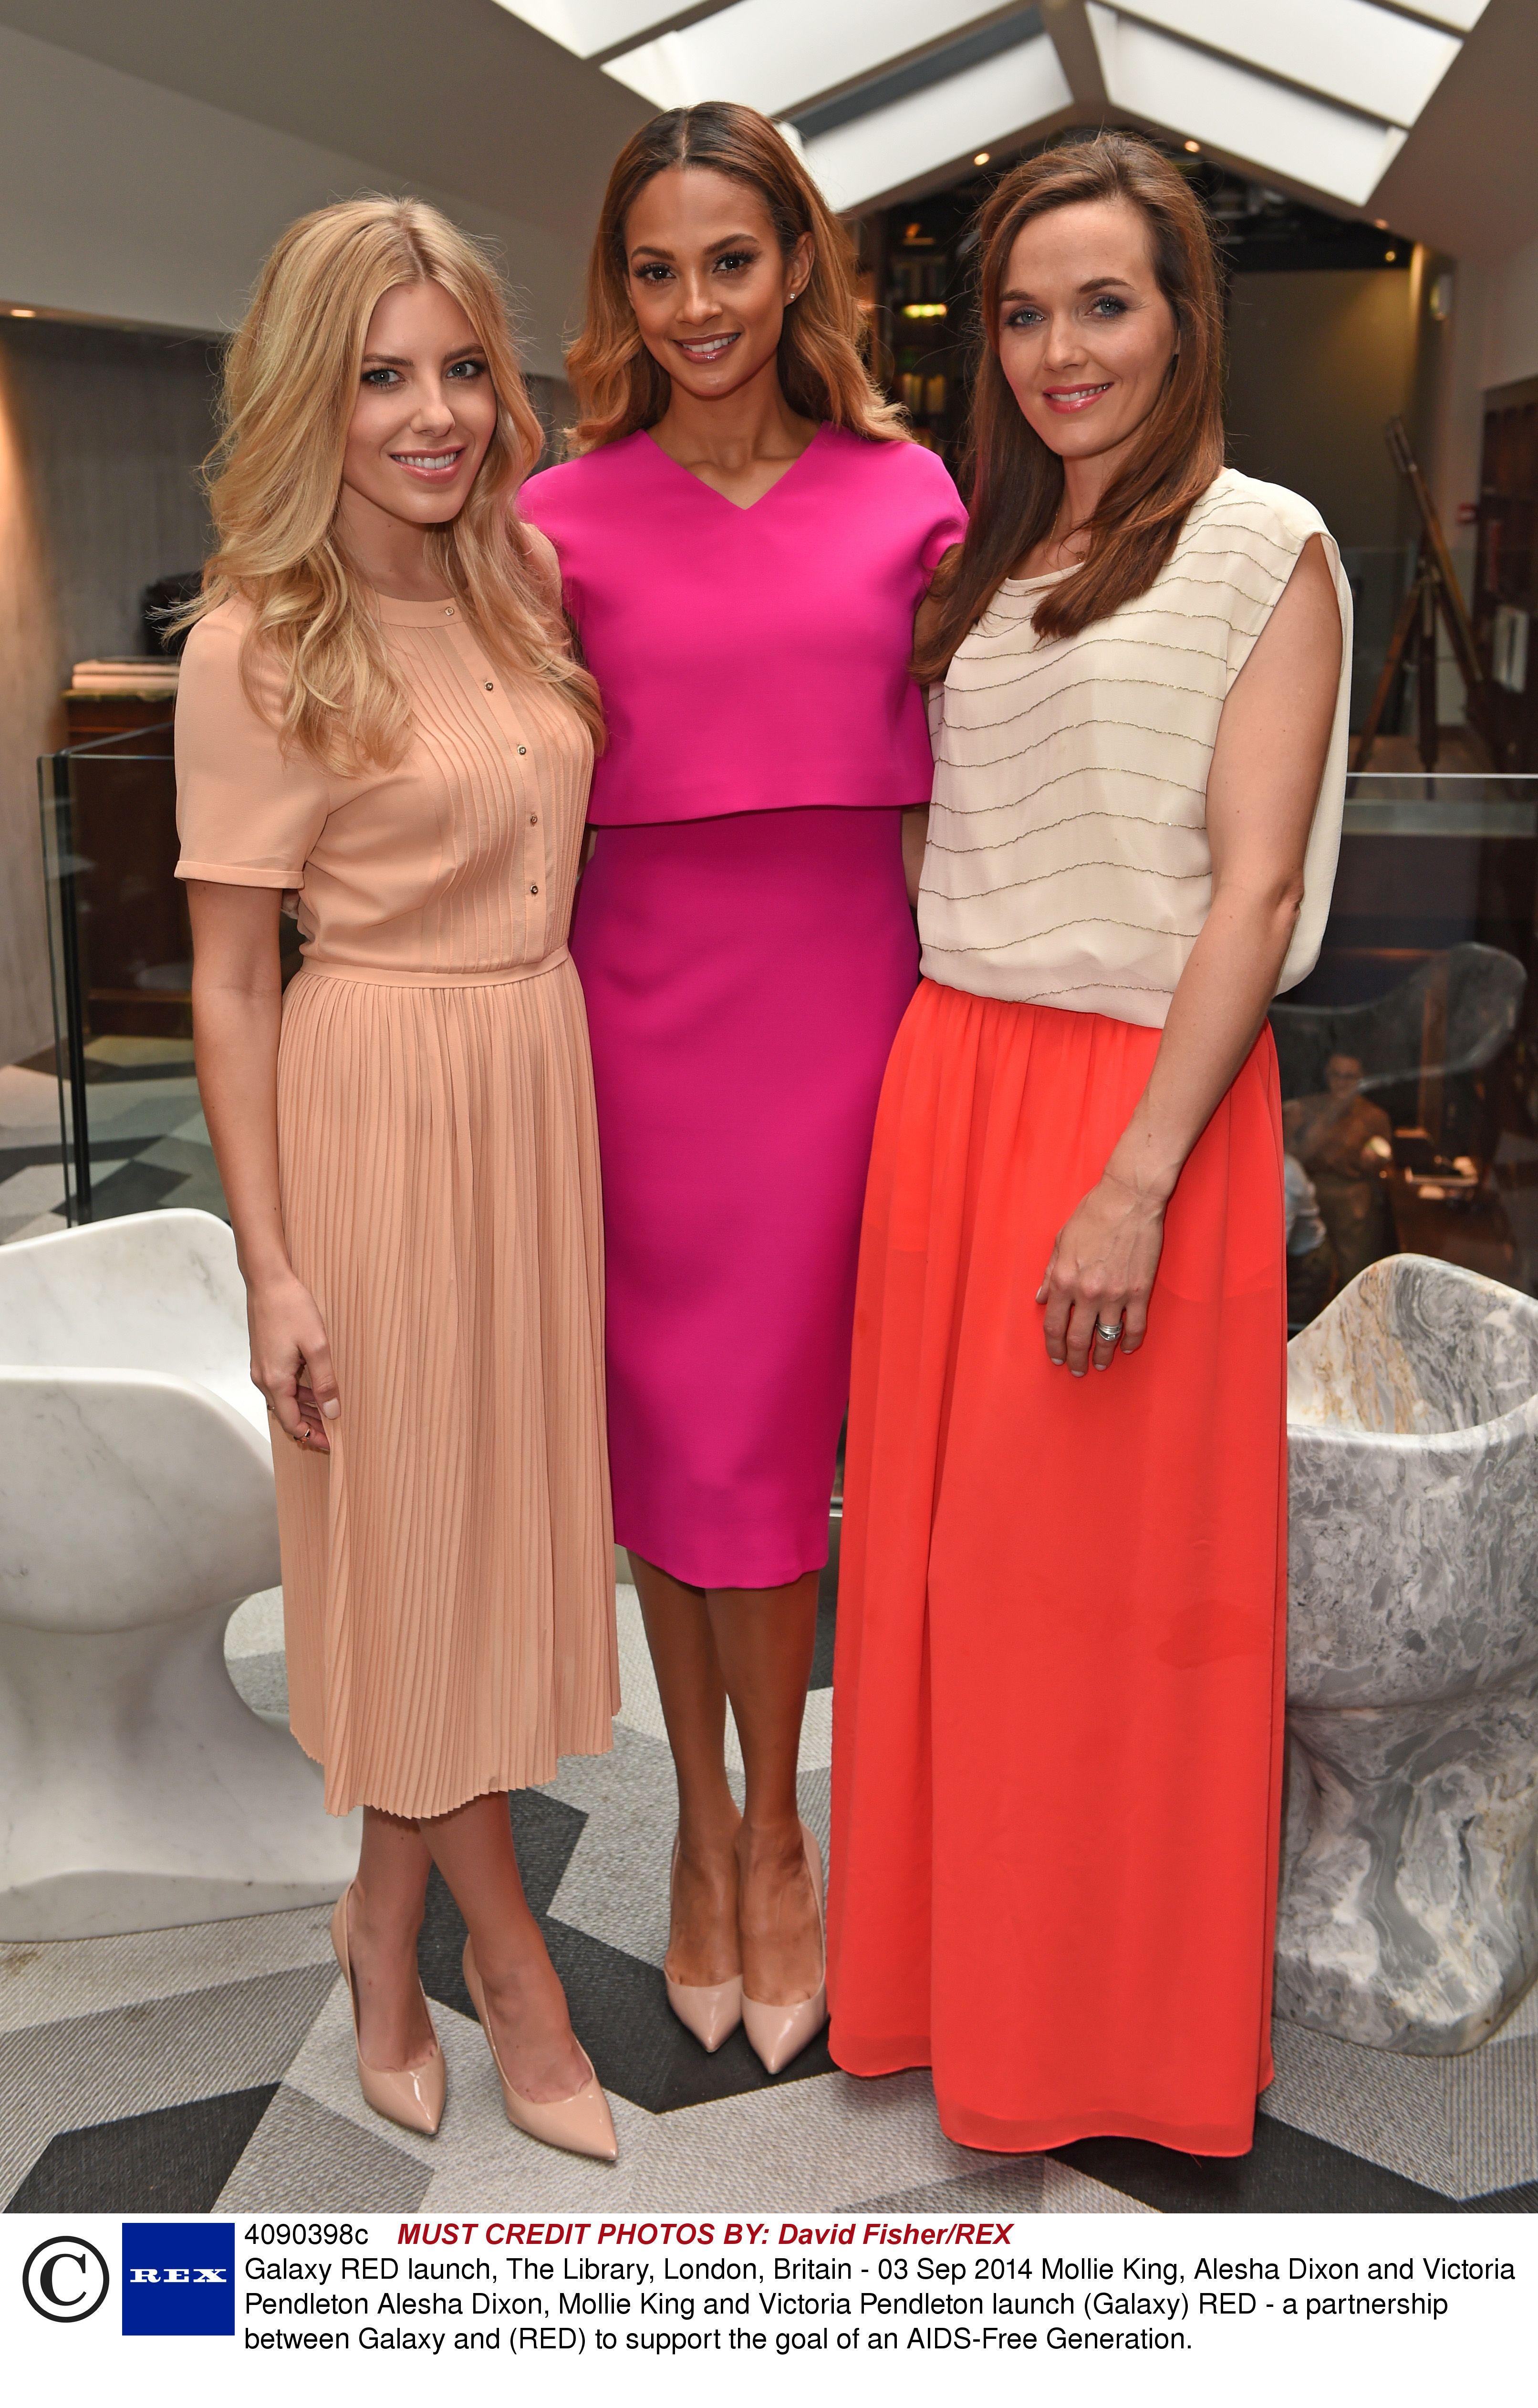 Mollie King, Alesha Dixon and Victoria Pembleton are pretty in pink